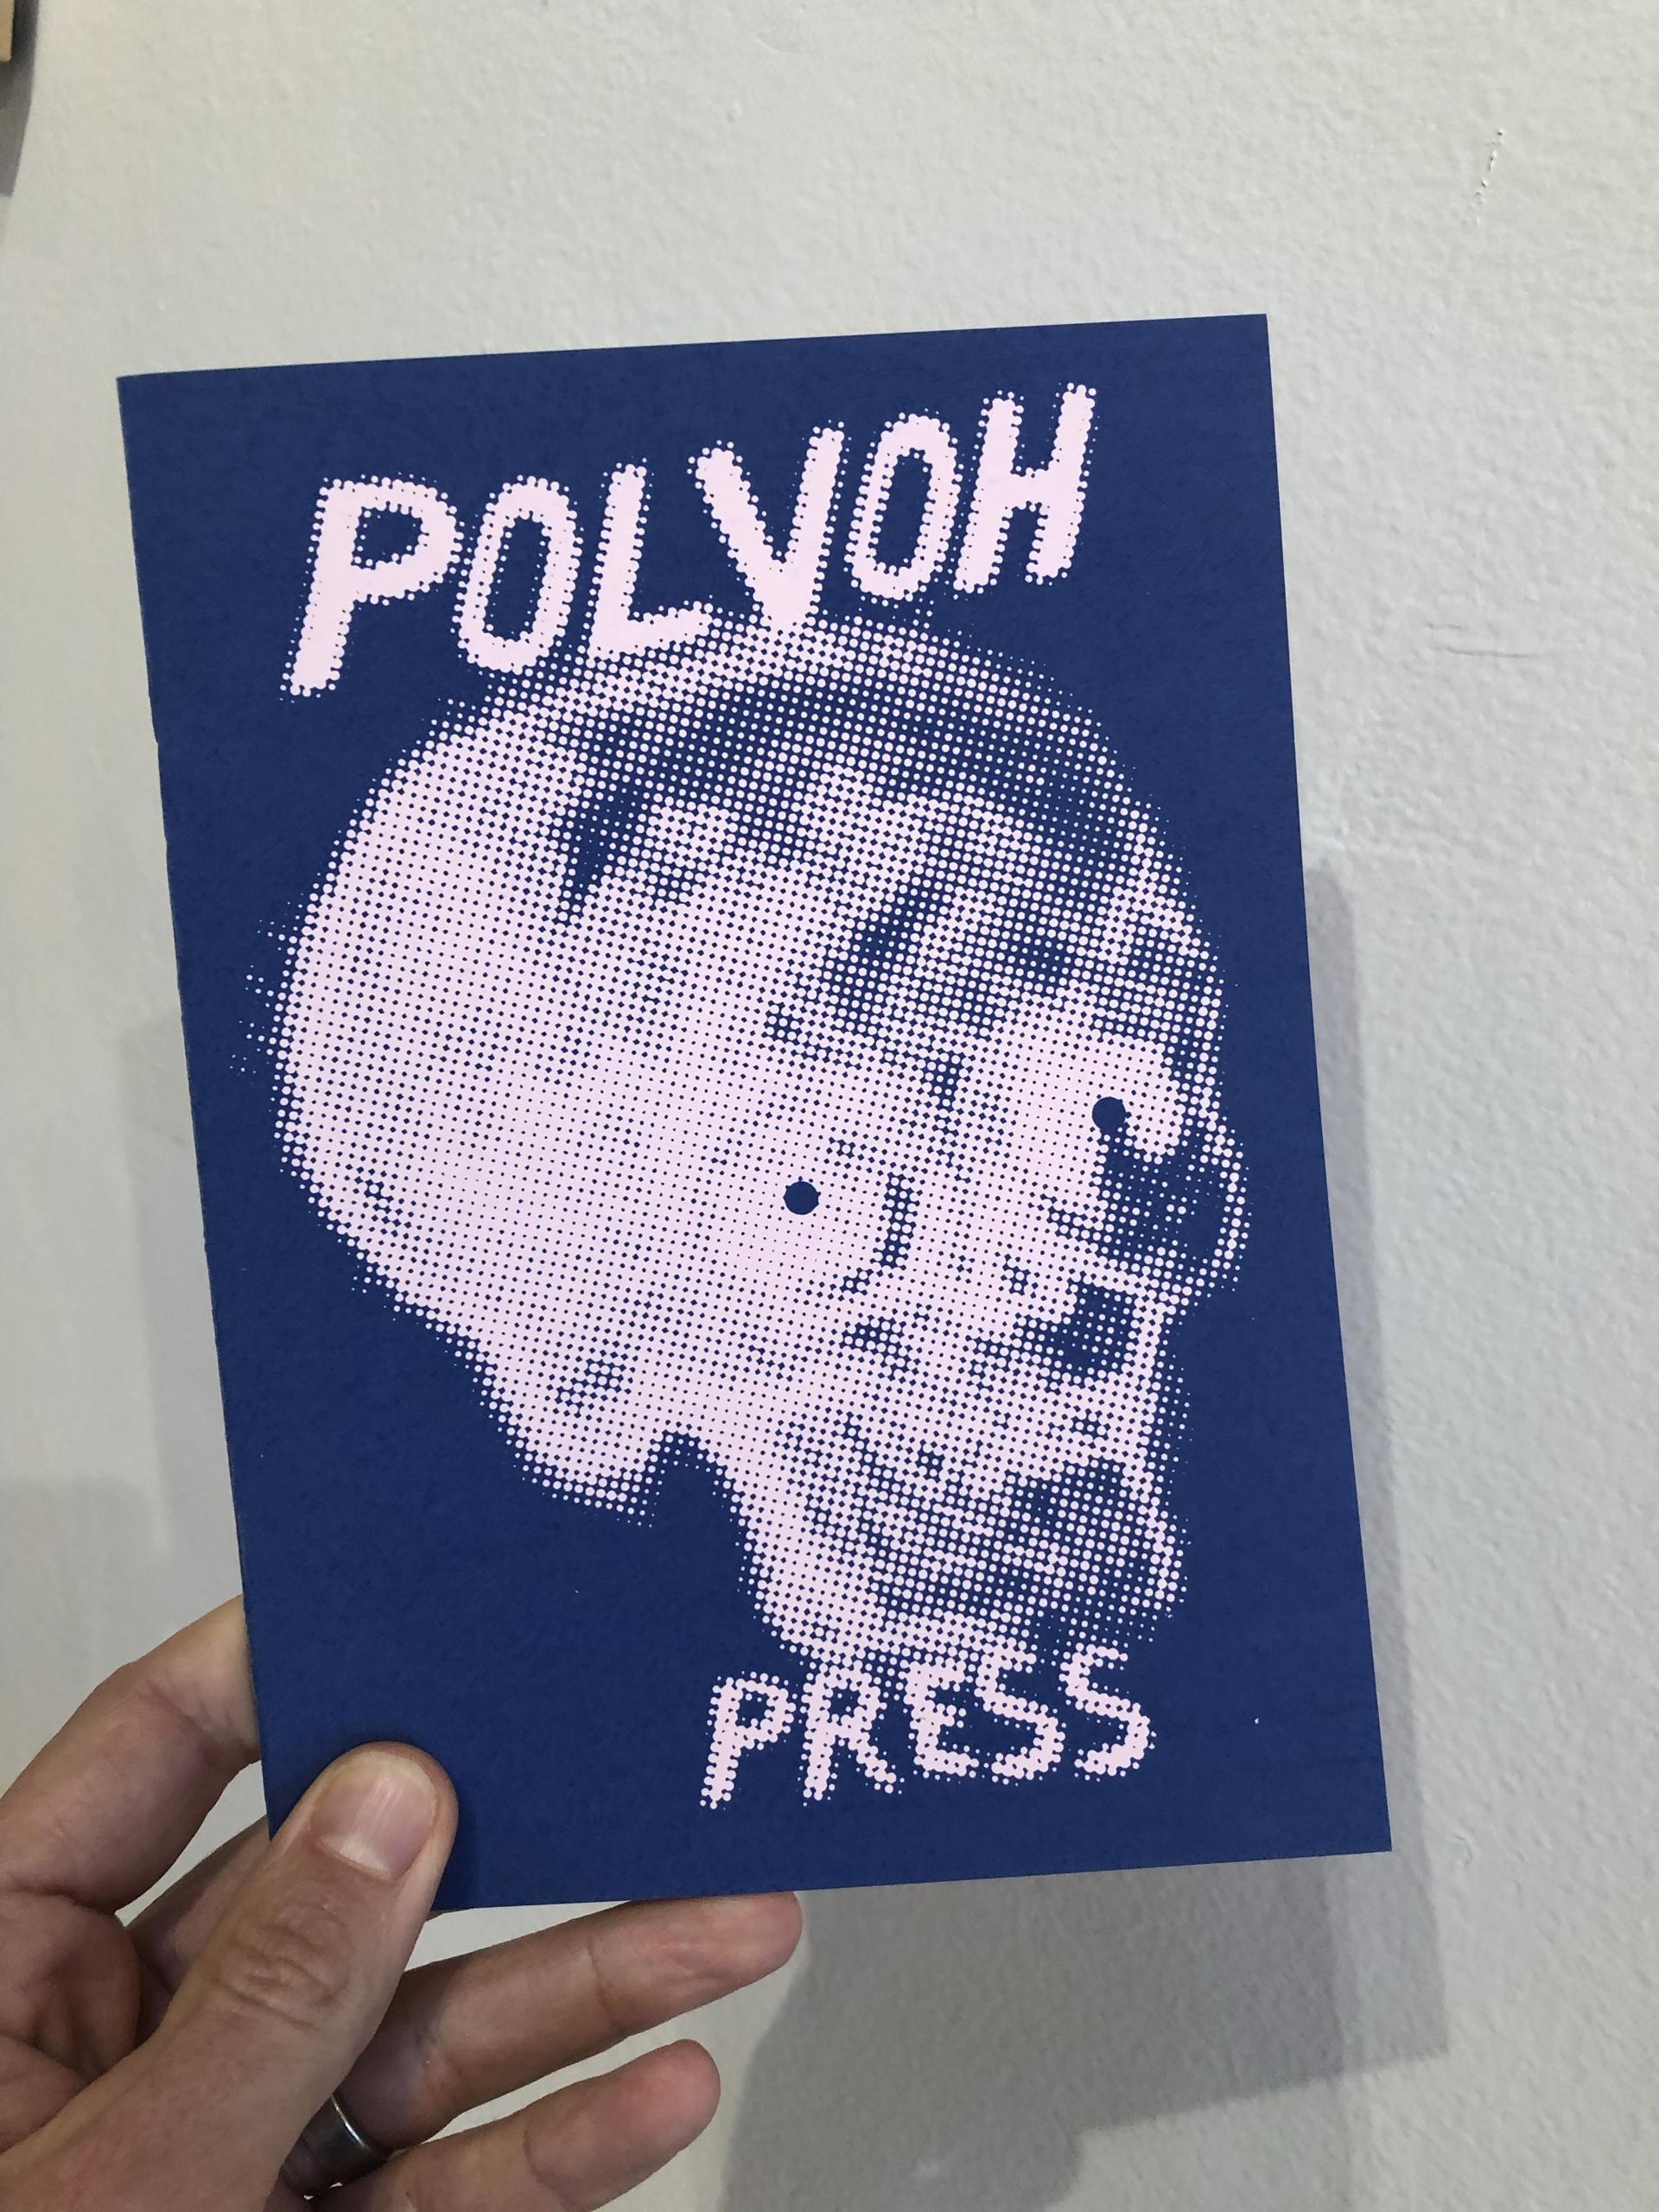 Polvoh Azul by Polvoh Press